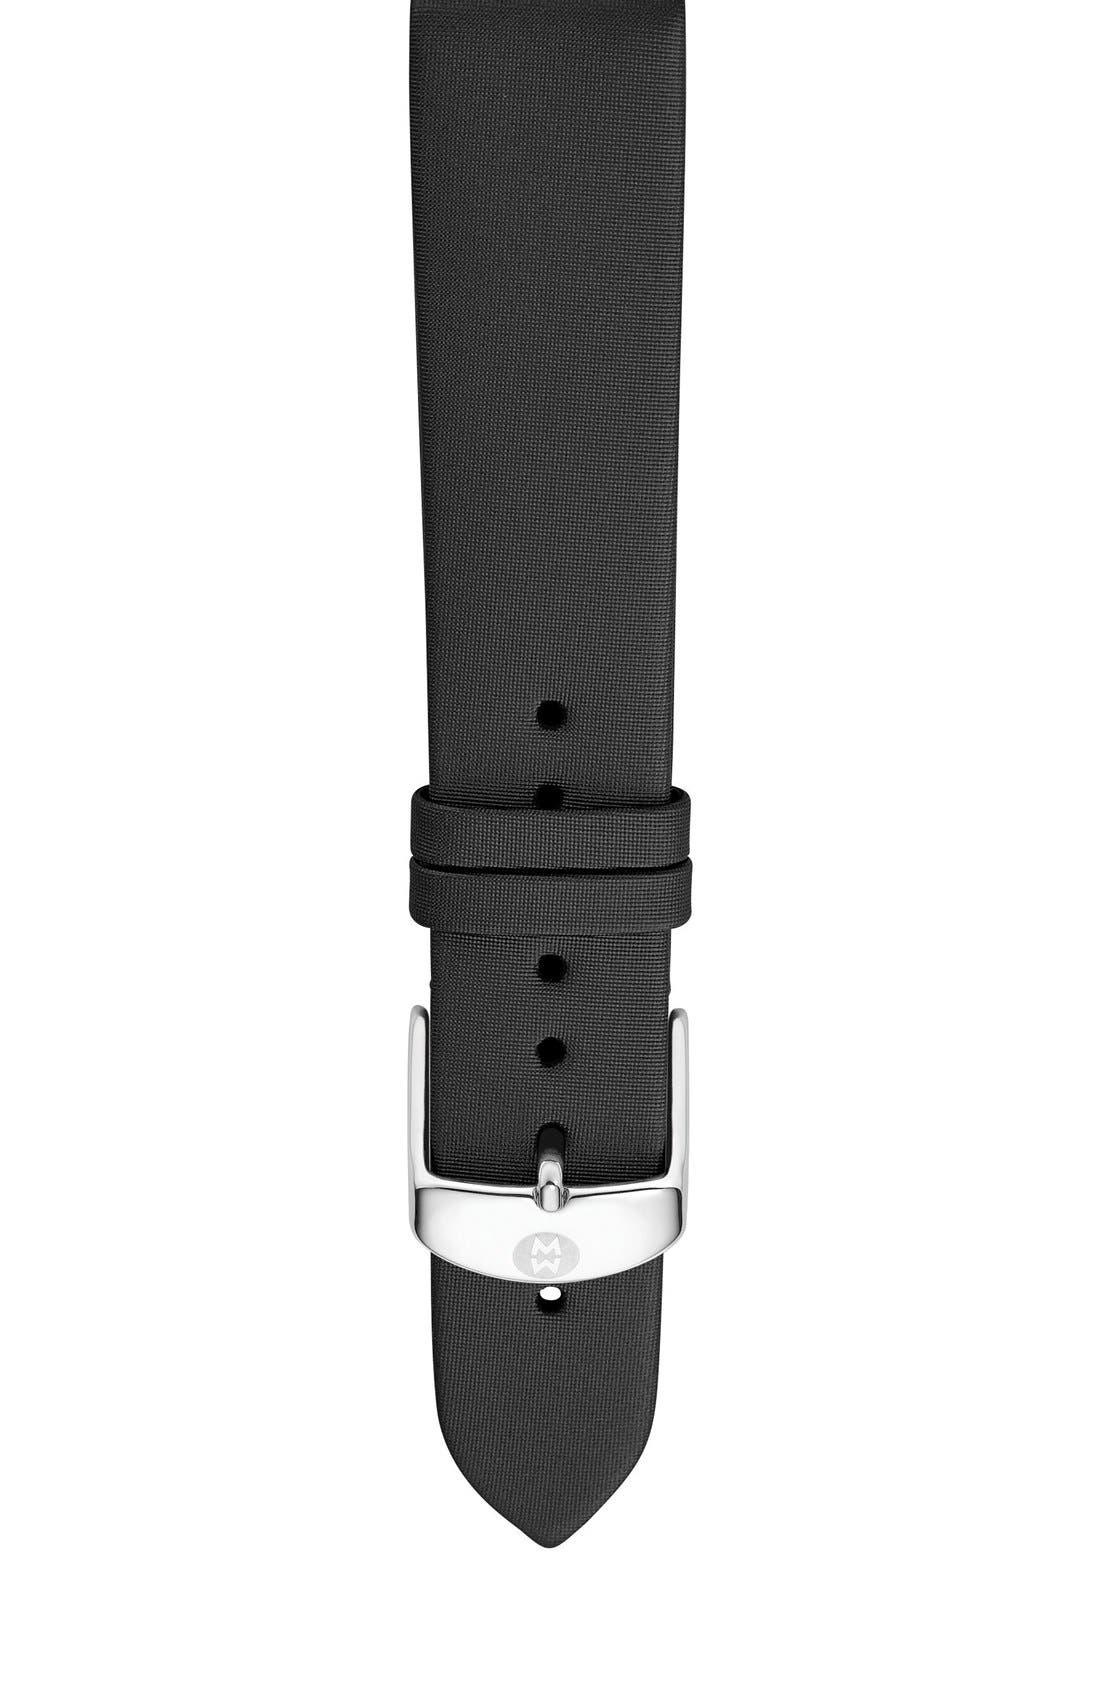 Main Image - MICHELE 16mm Satin Watch Strap